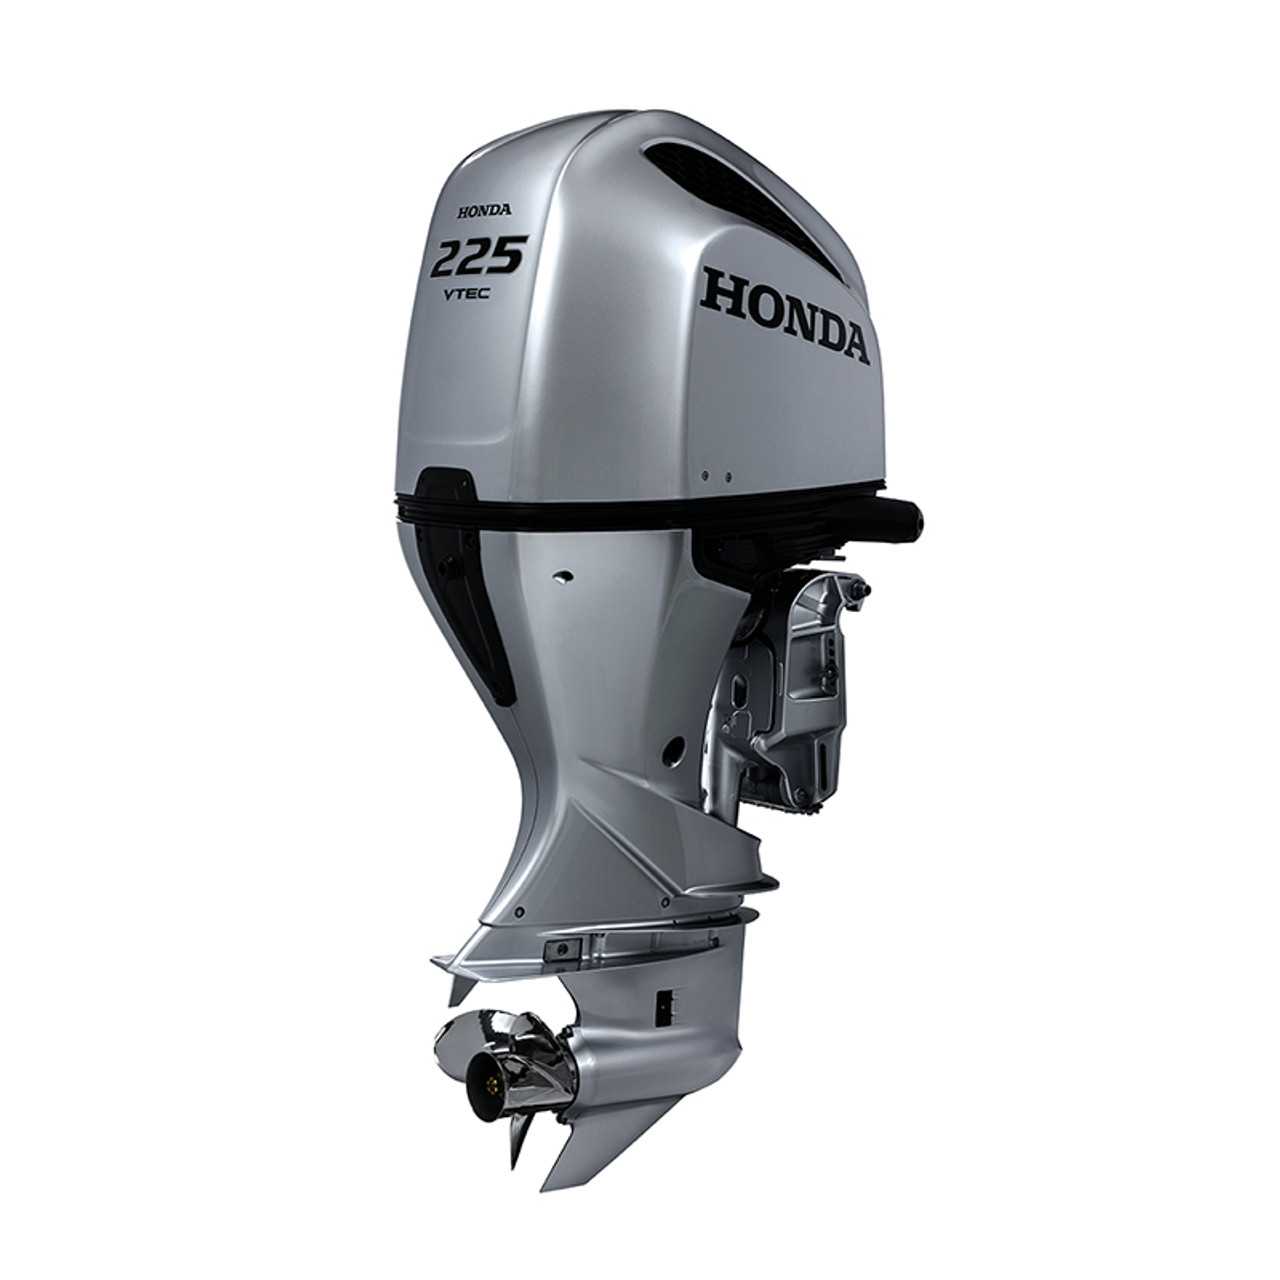 small resolution of new 2019 honda bf225 4 stroke outboard motor